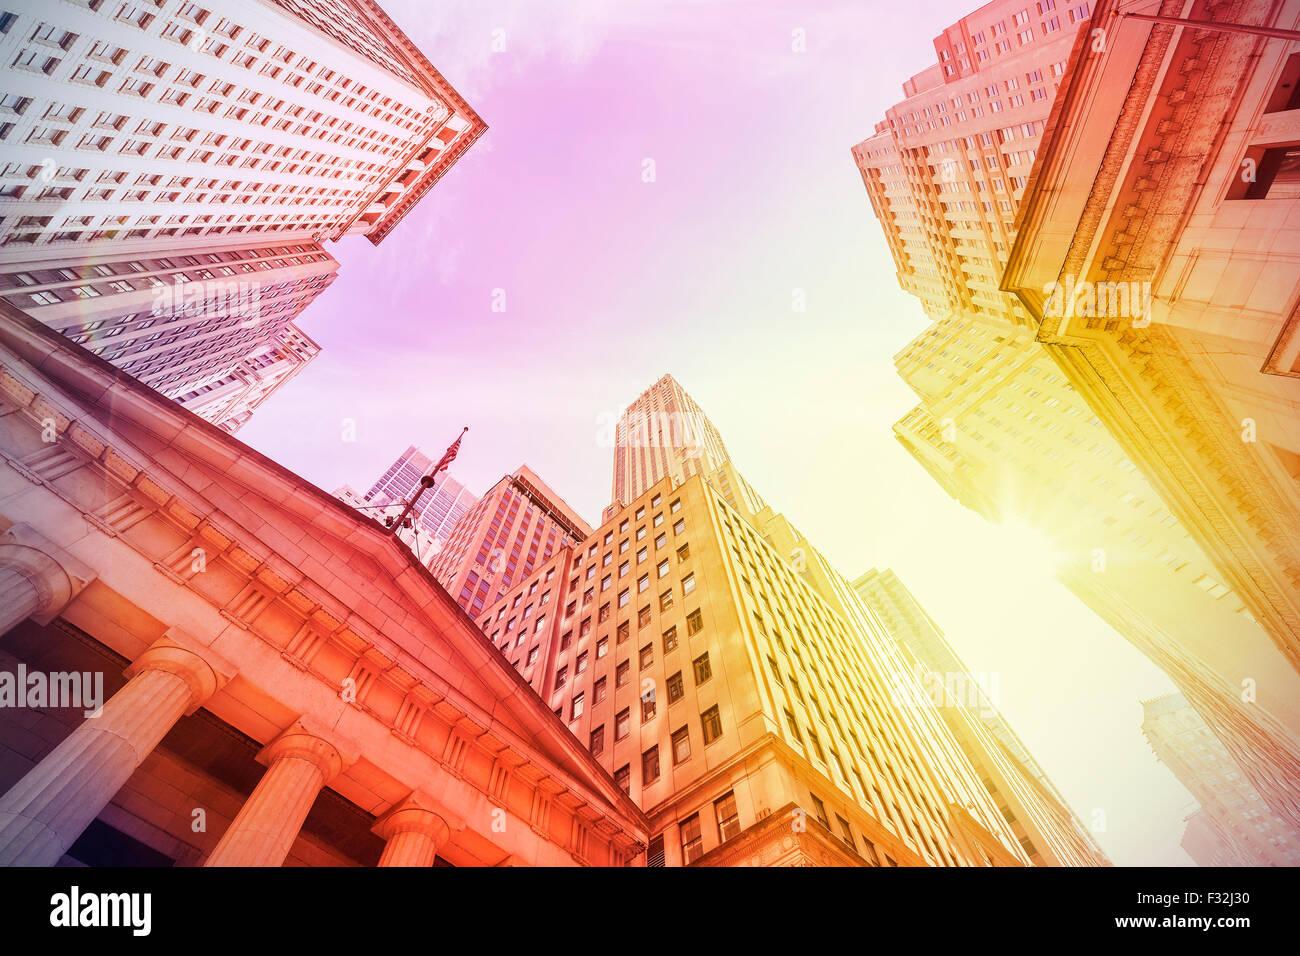 Instagram Vintage Wall Street filtrée au coucher du soleil, Manhattan, New York City, USA. Photo Stock